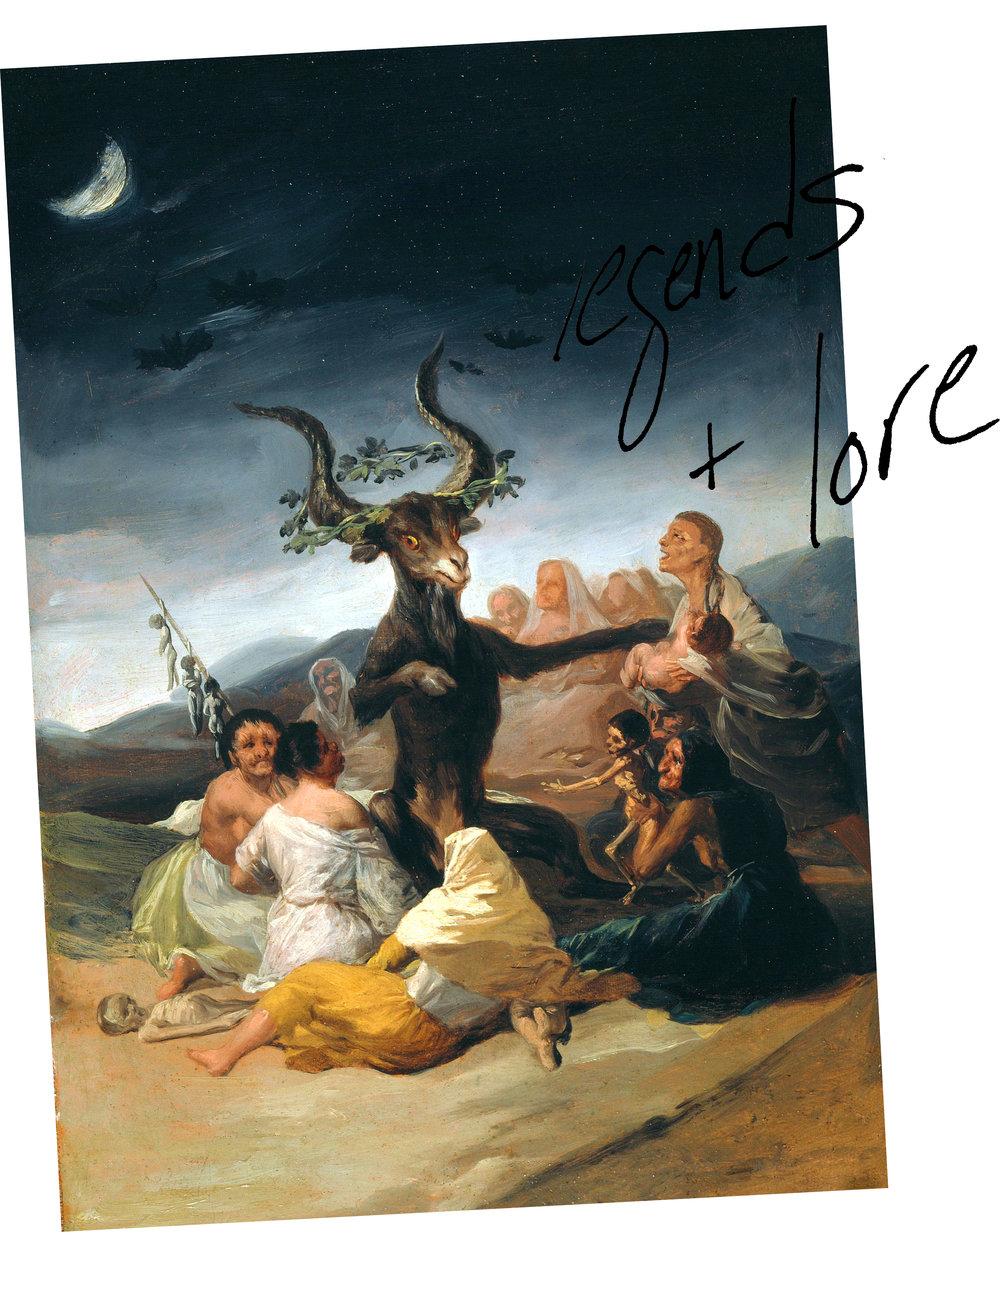 Francisco Goya,  Witches' Sabbath, 1798